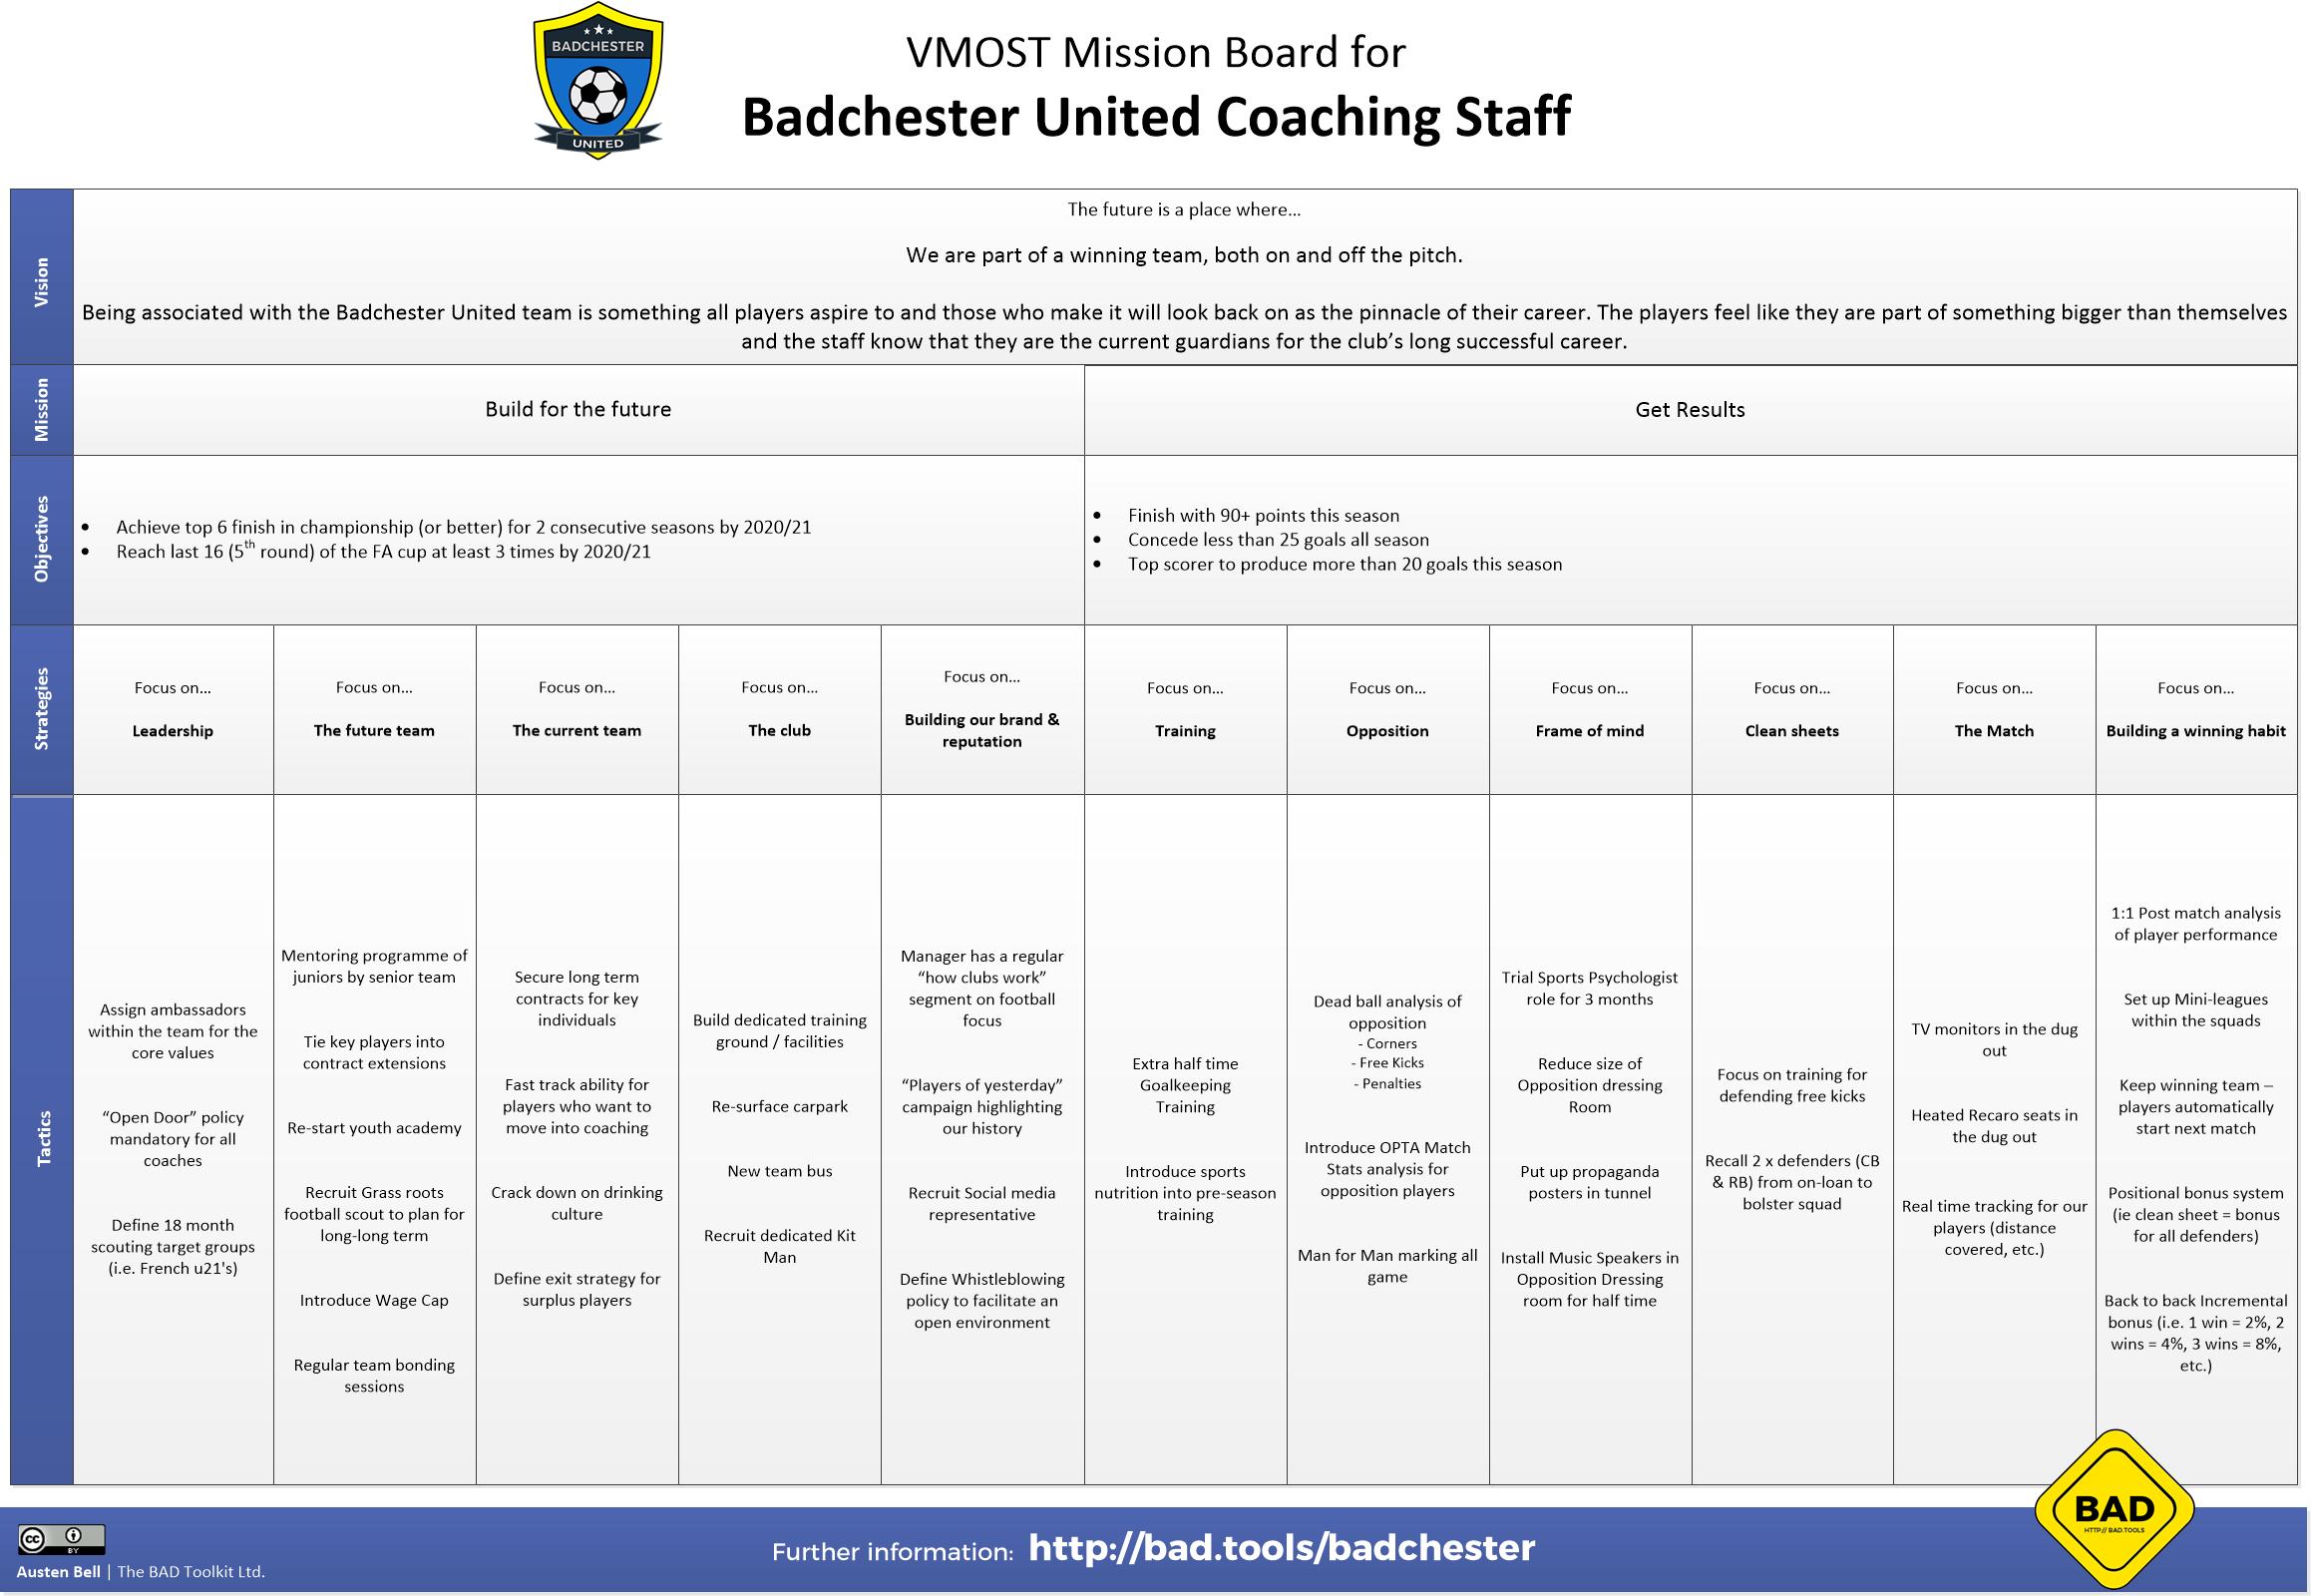 Badchester – Team VMOST